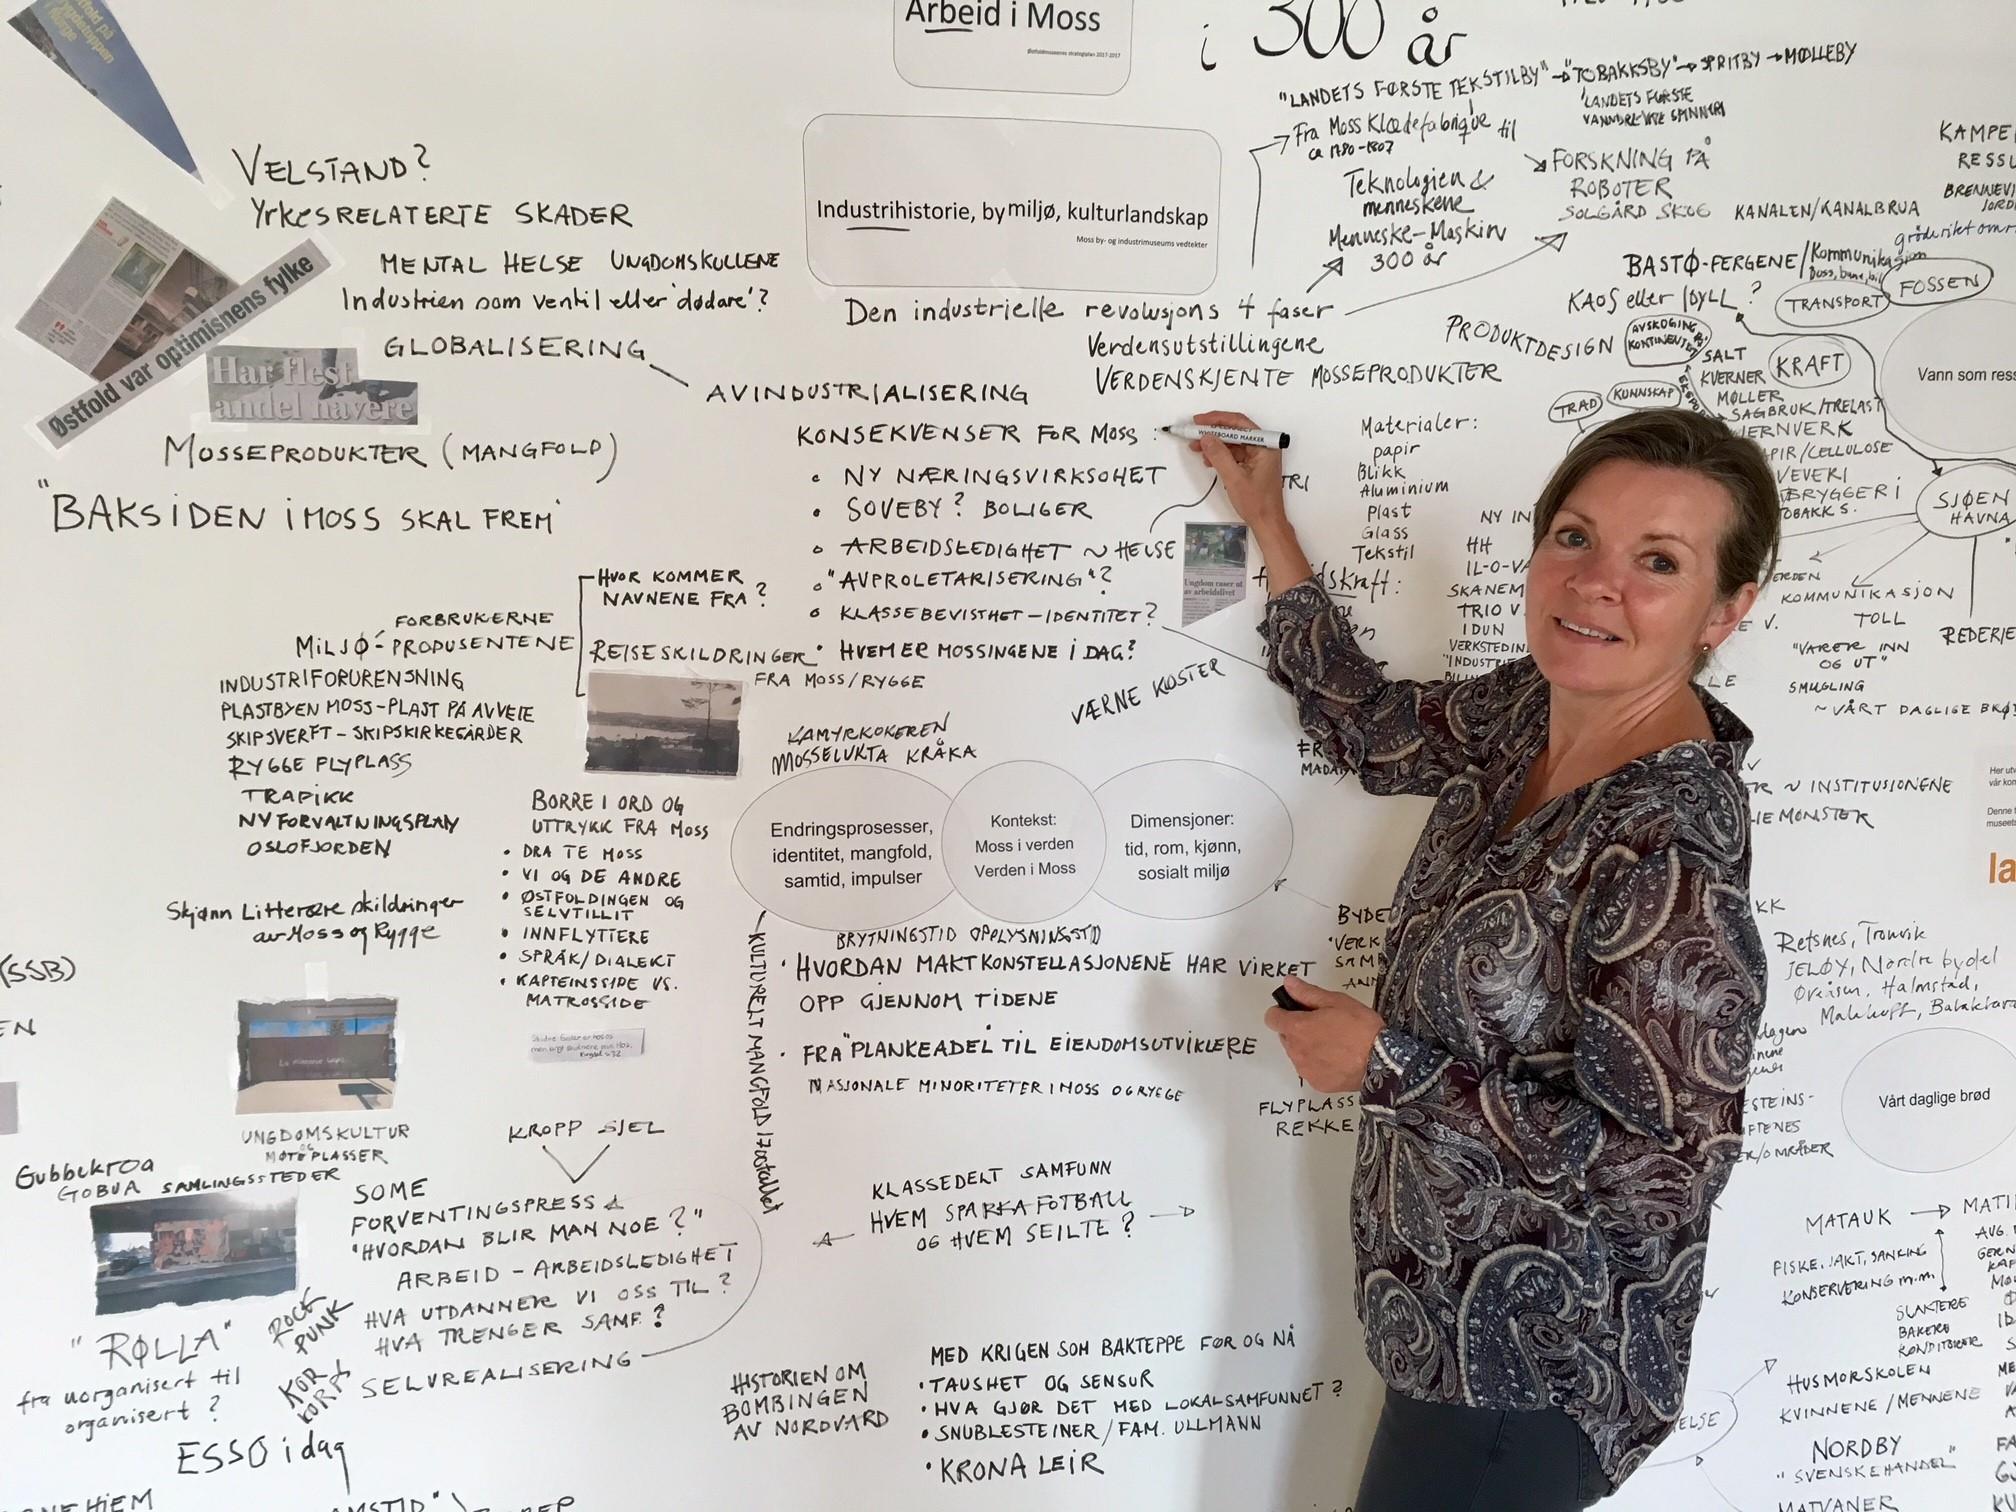 Museumsvert Vibeke Nielsen noterer gode innspill på museets idé-kart. Foto: Bjørg Holsvik / Moss by- og industrimuseum